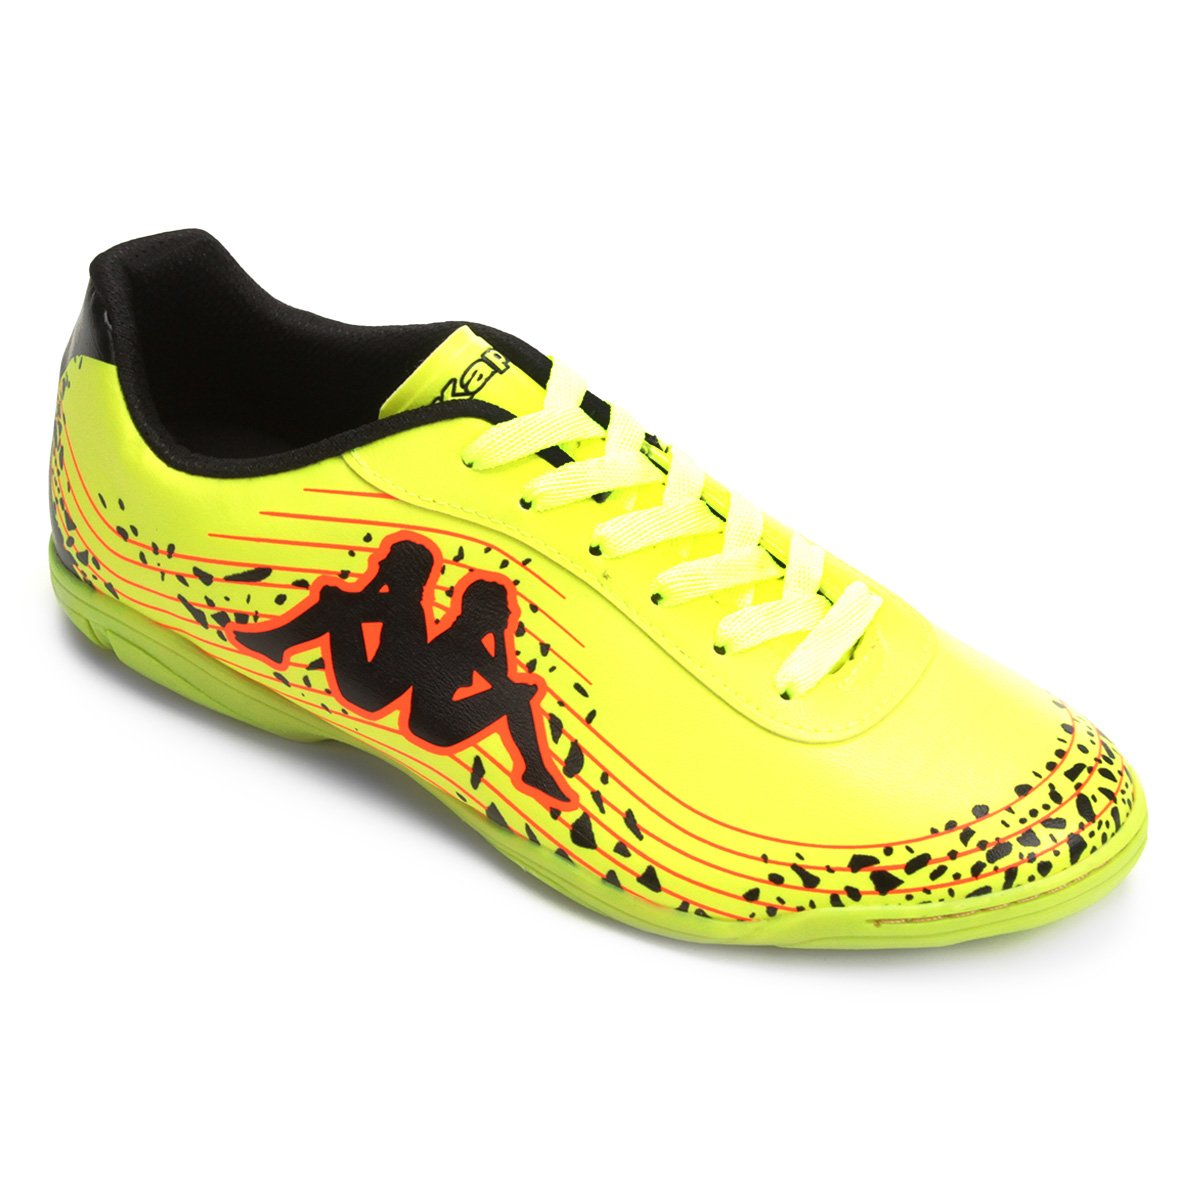 39%OFF Chuteira Futsal Kappa Lightning 0ee5652576620